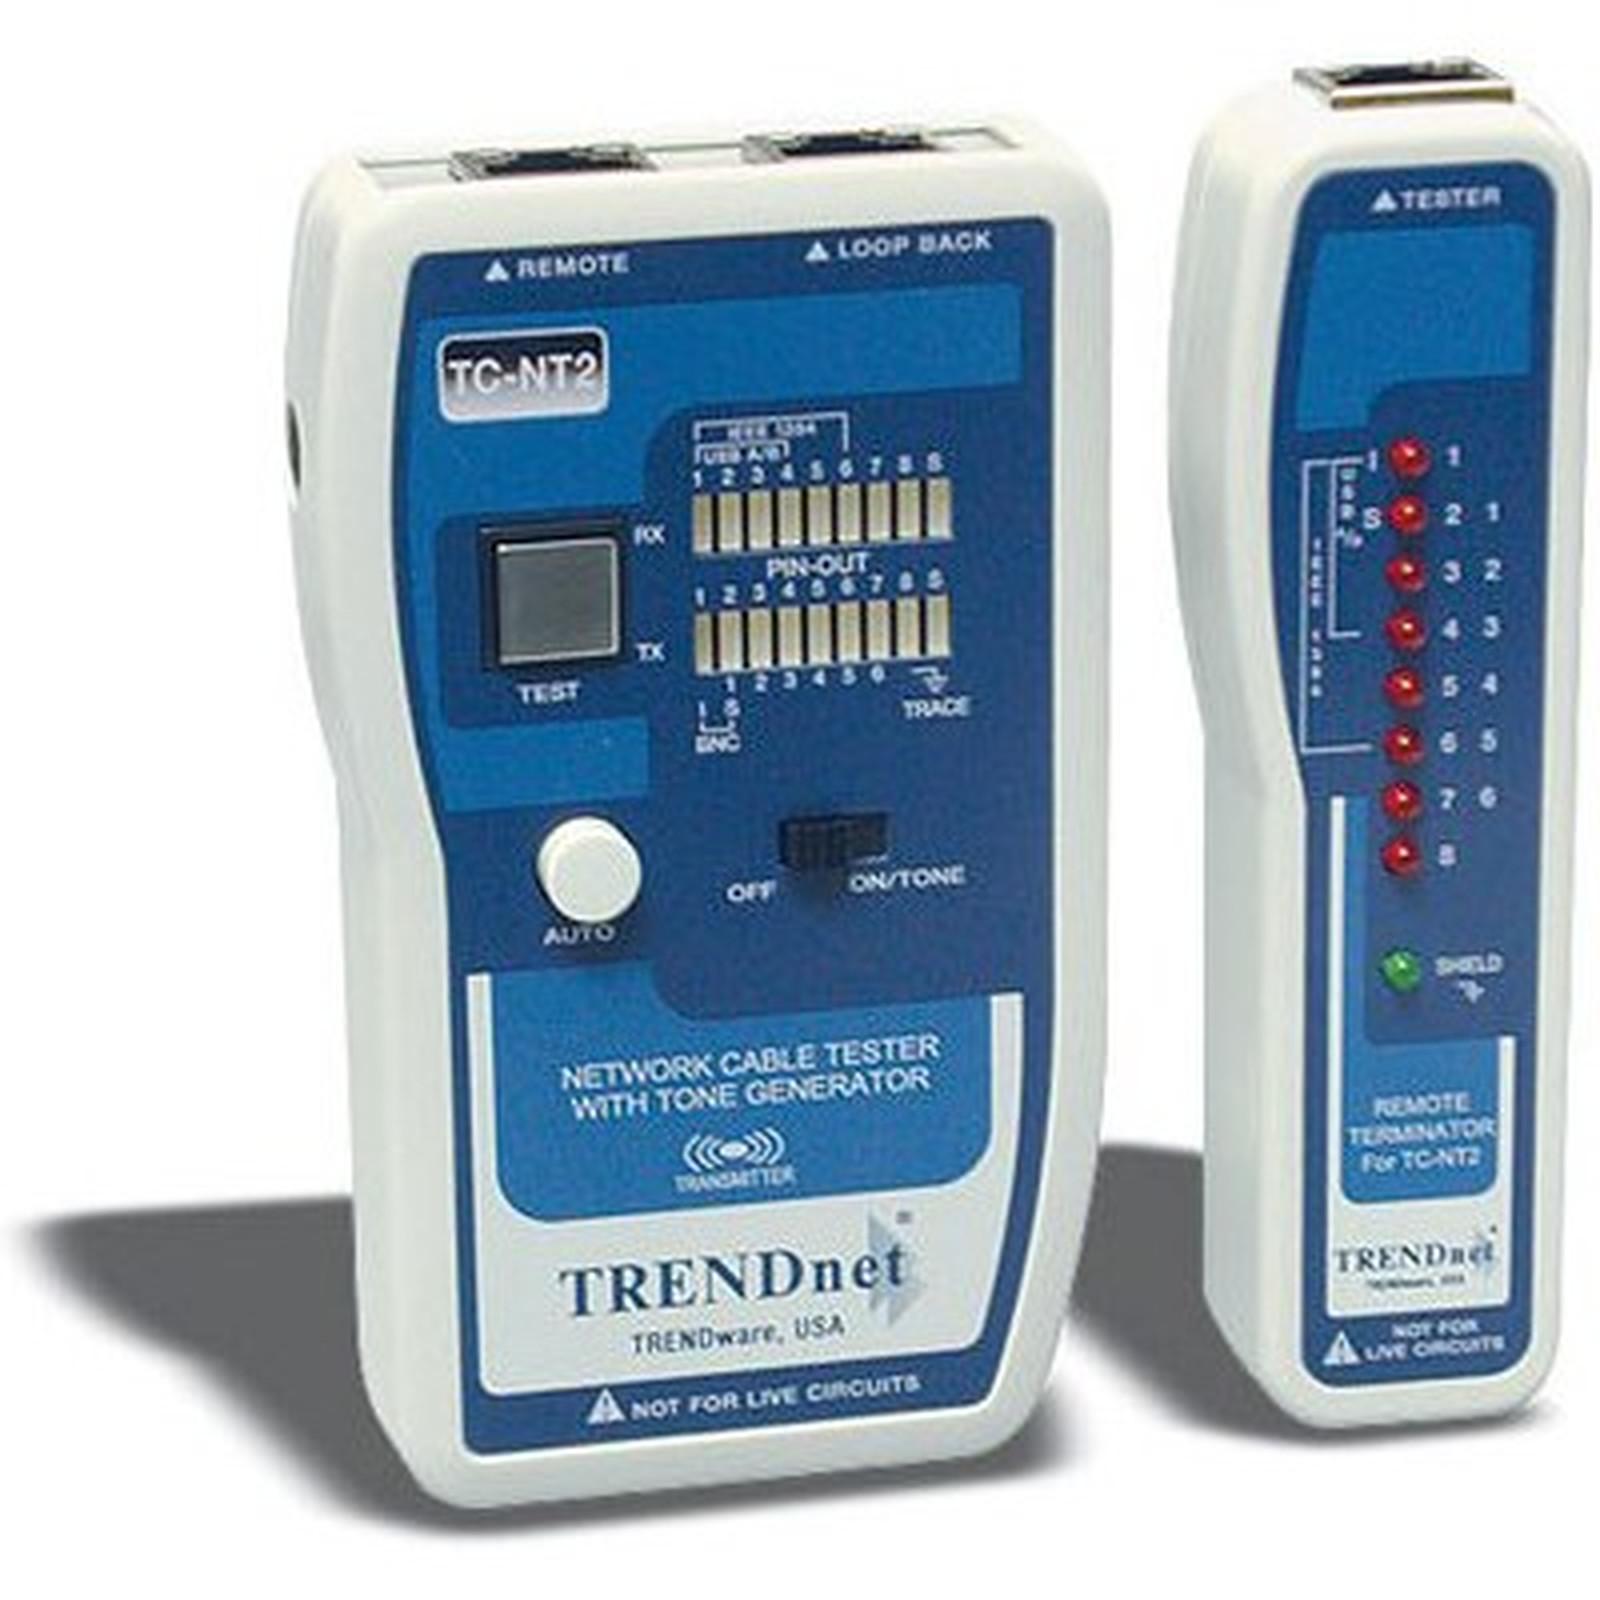 TRENDnet TC-NT2